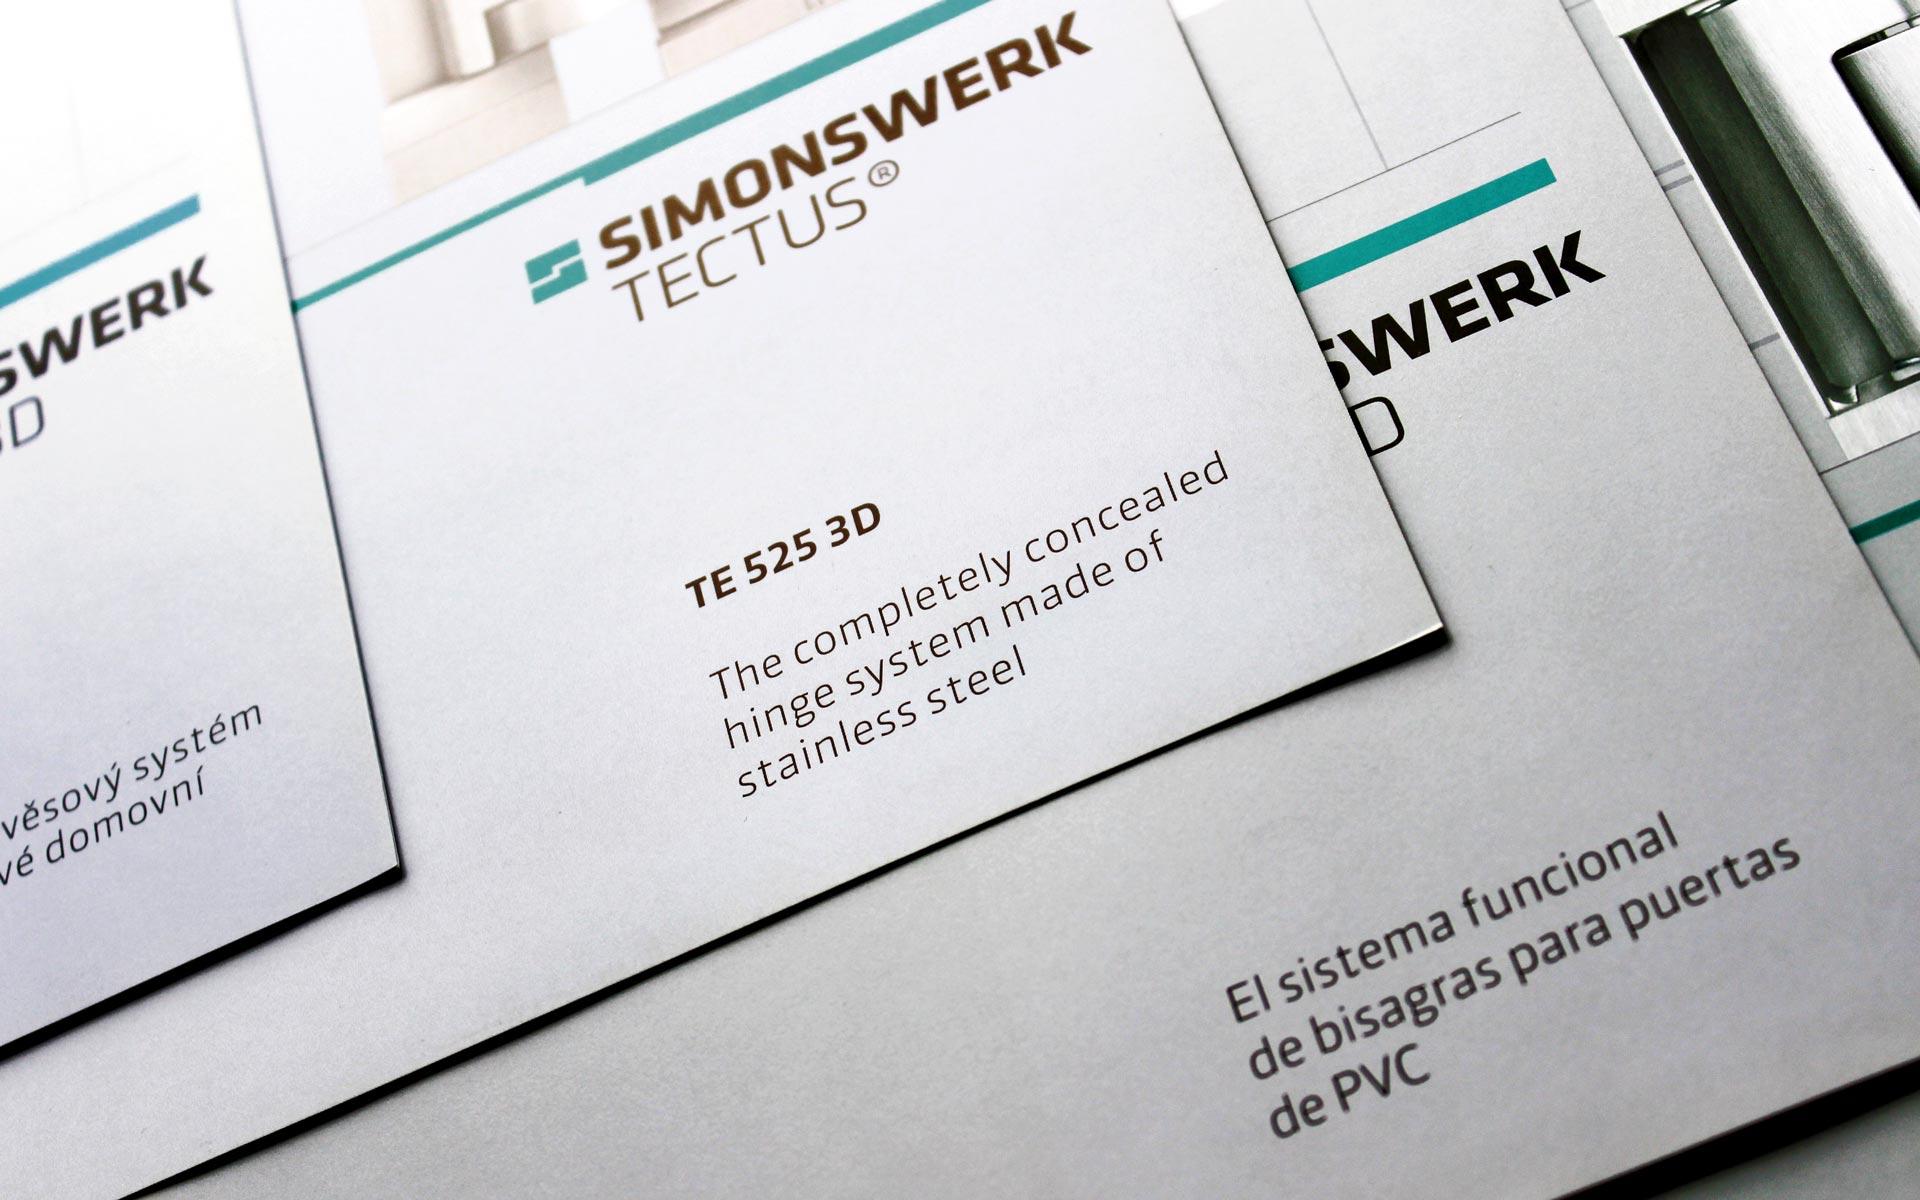 Simonswerk Broschürenwesen, Corporate Design, Produktbroschüren Titel-Detail